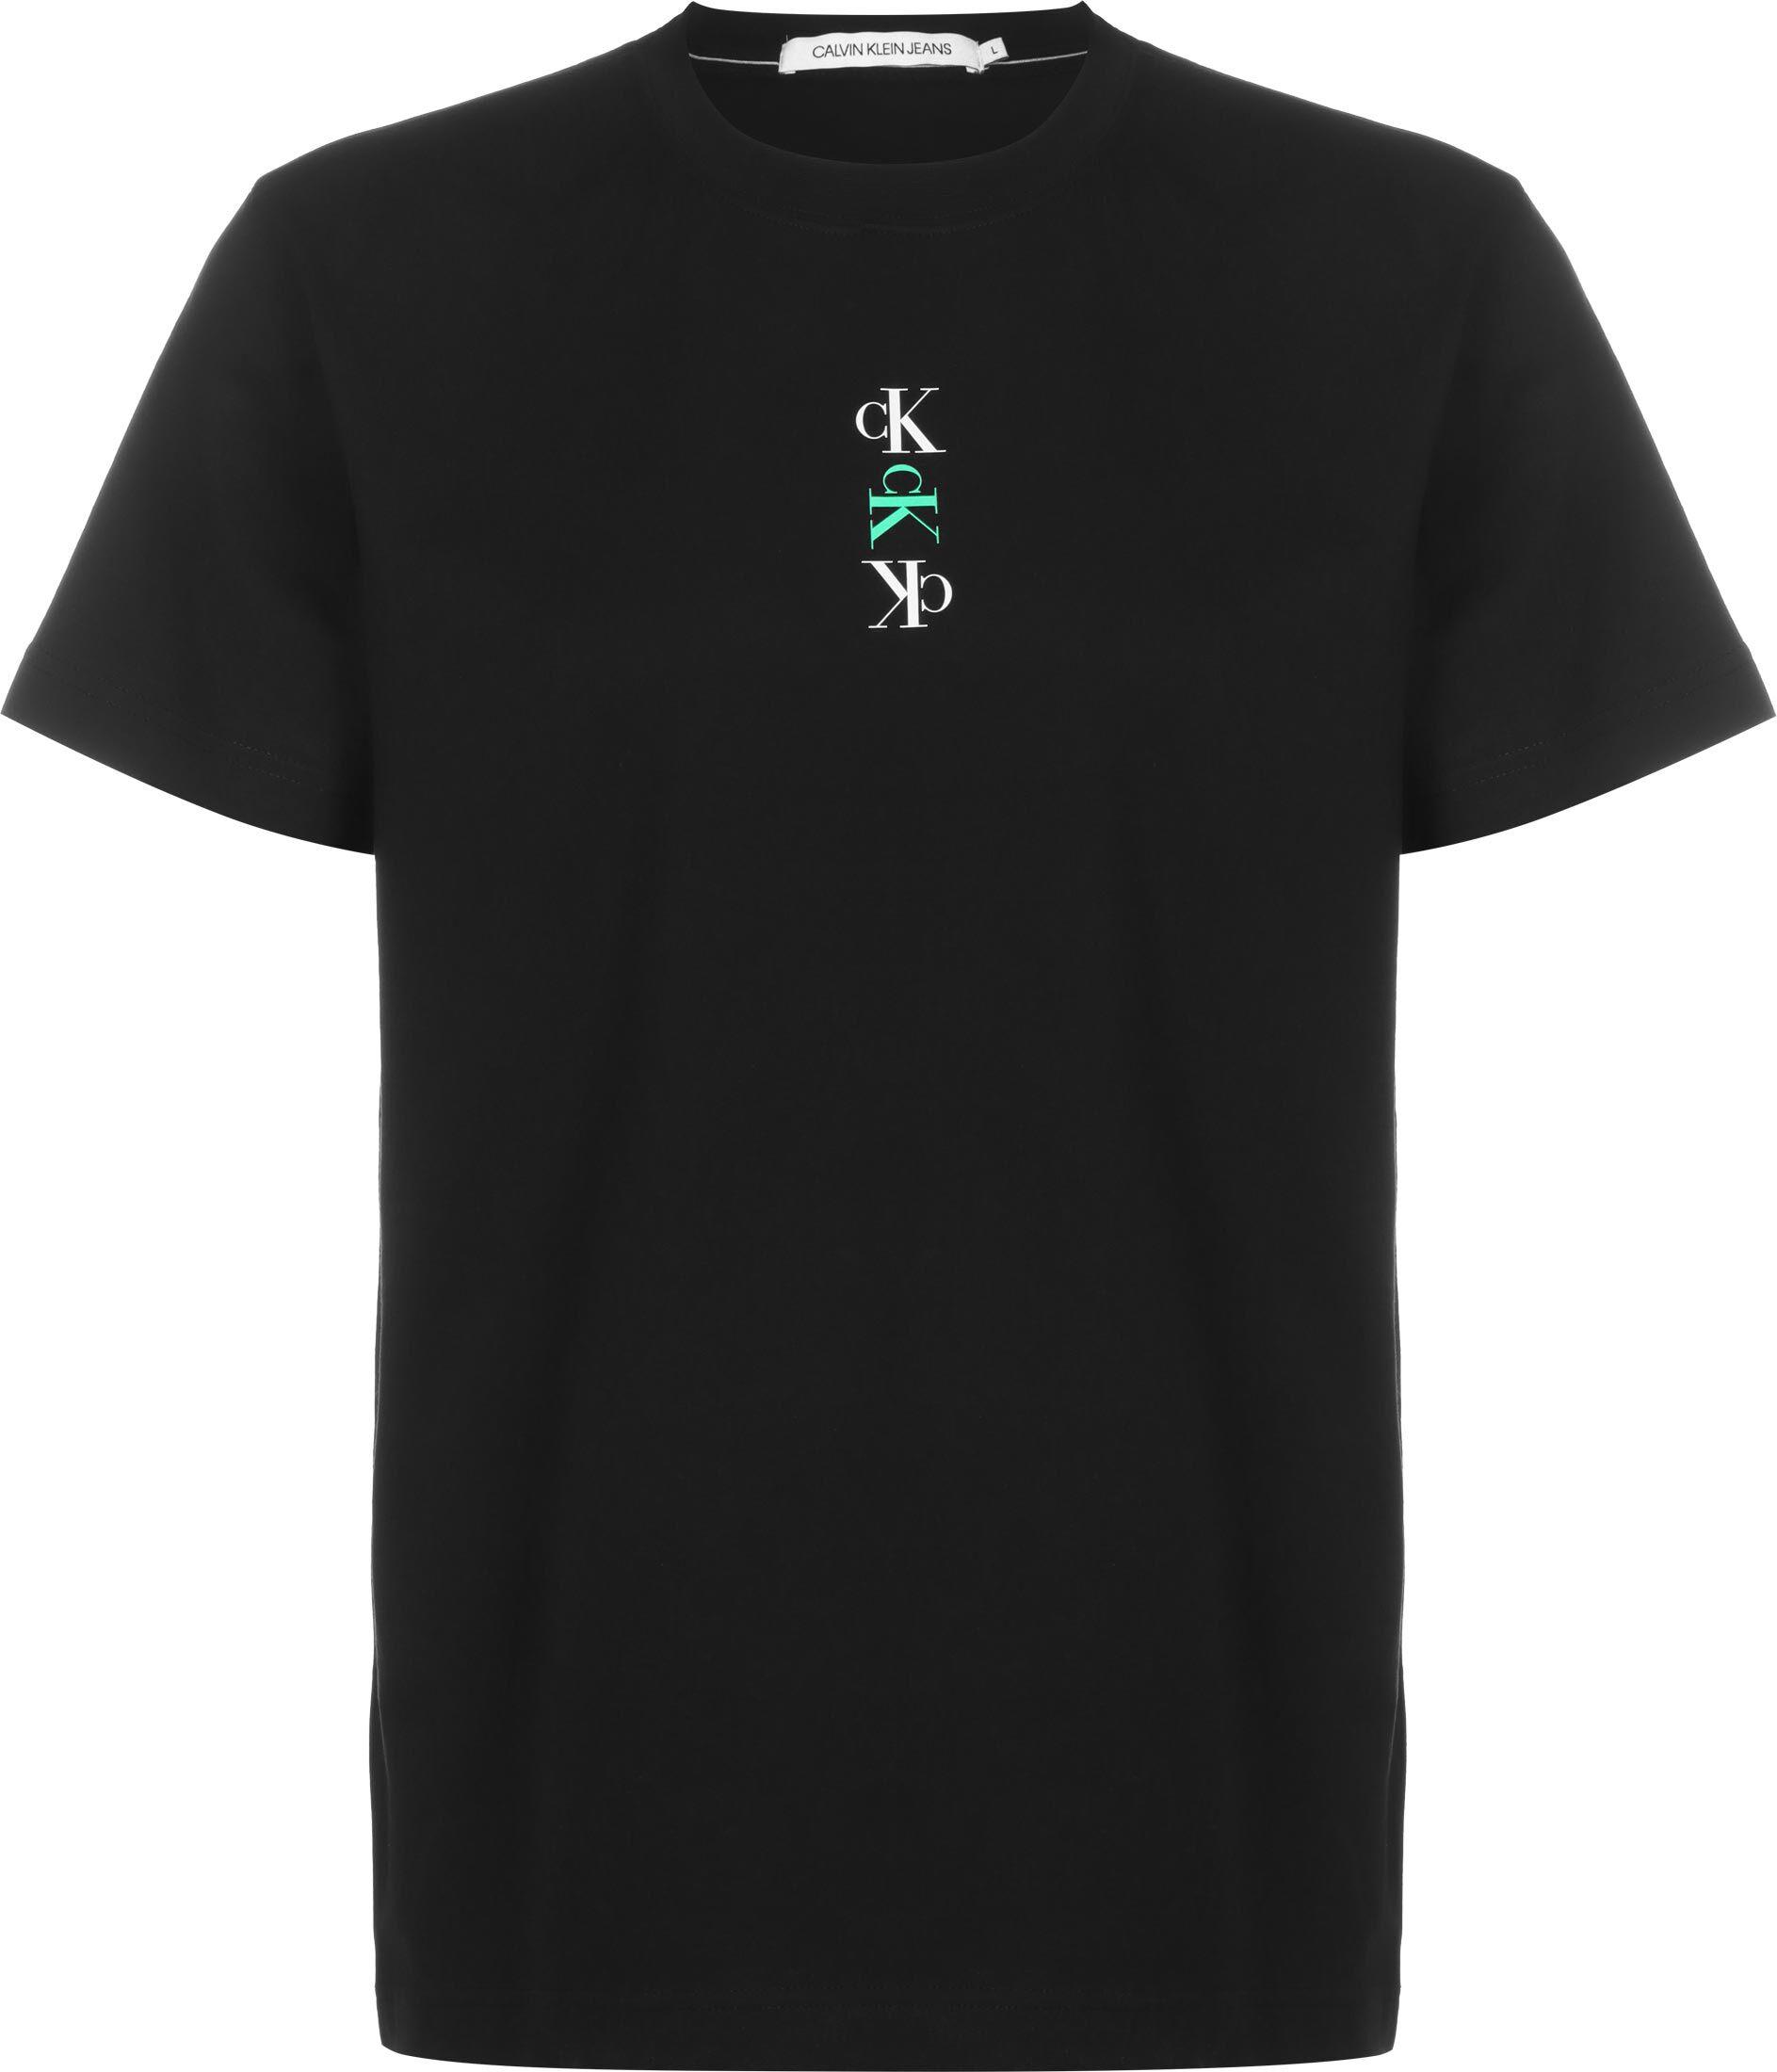 Calvin Klein Jeans Calvin Klein Repeat Graphic Text, taille M, homme, noir